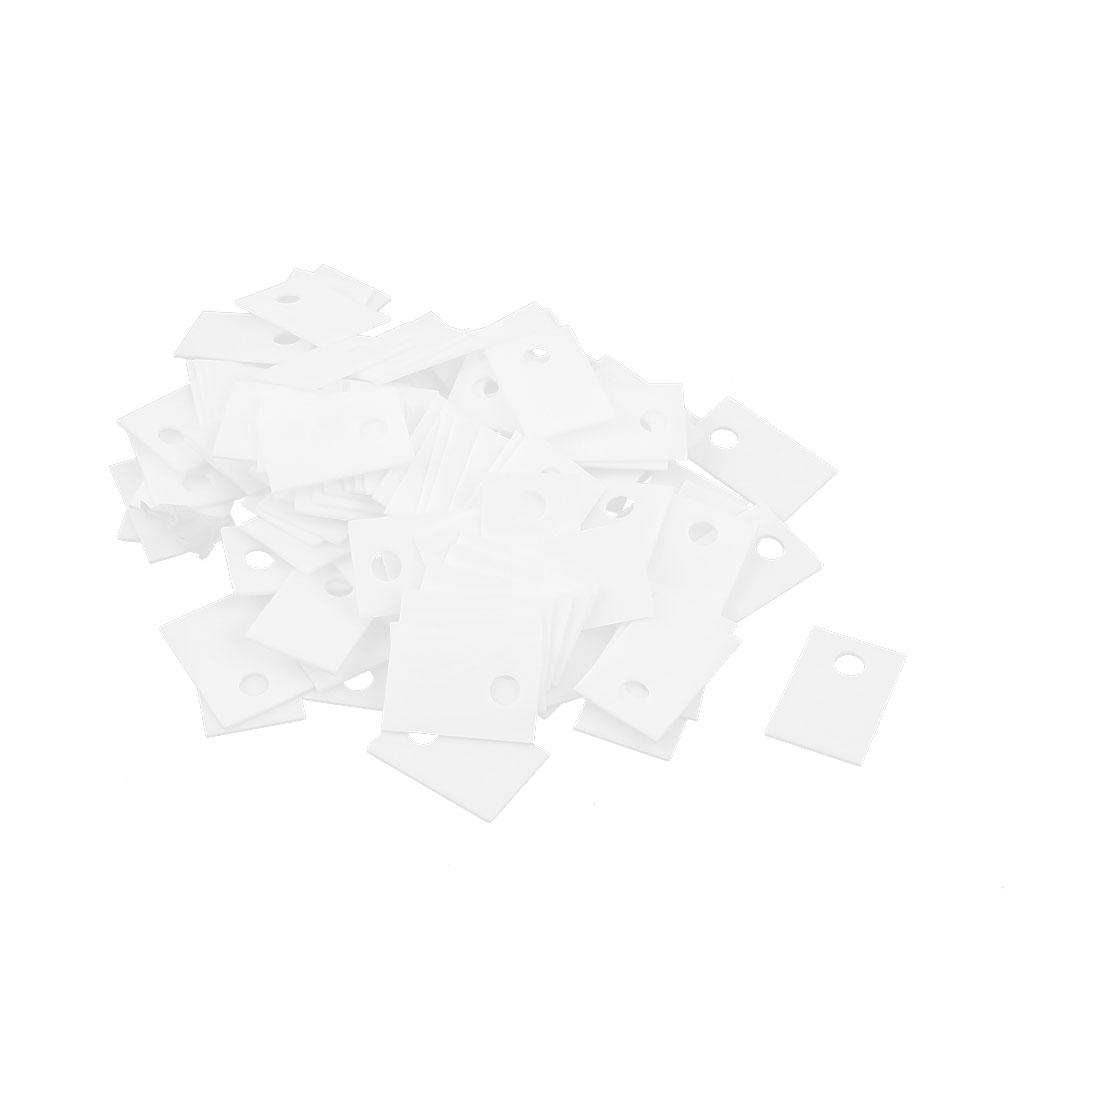 100Pcs 12x18mm Ceramic Insulator Plates Sheet for Transistor Heat Sink